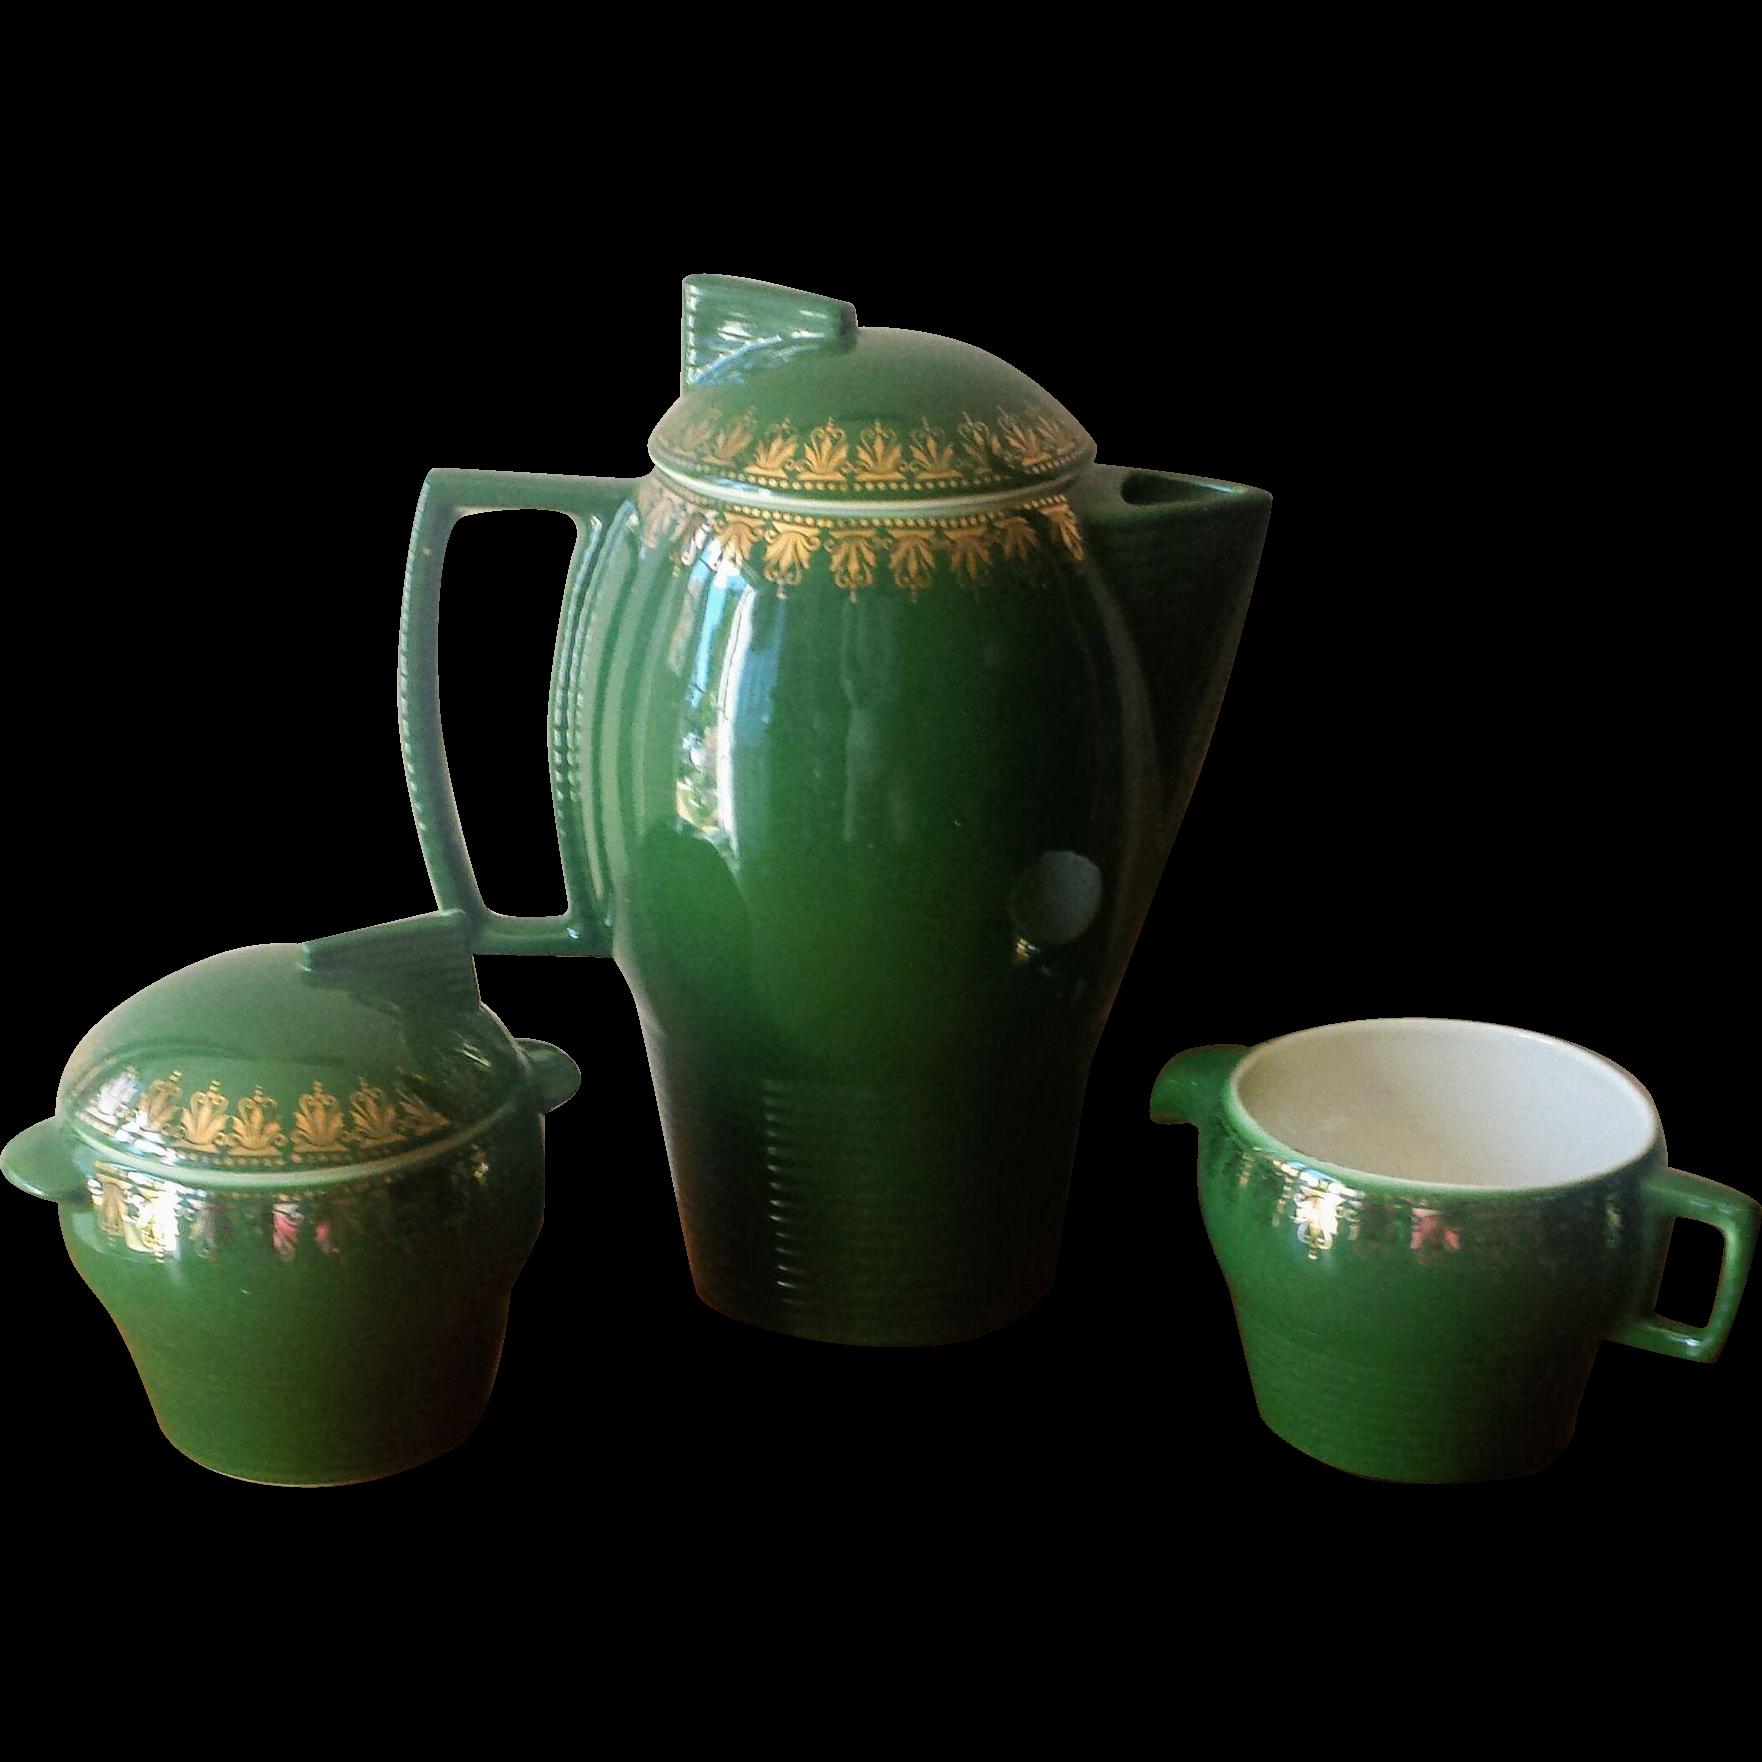 Vintage Art Deco Green Ceramic Coffee Pot Set with Sugar Bowl and Creamer